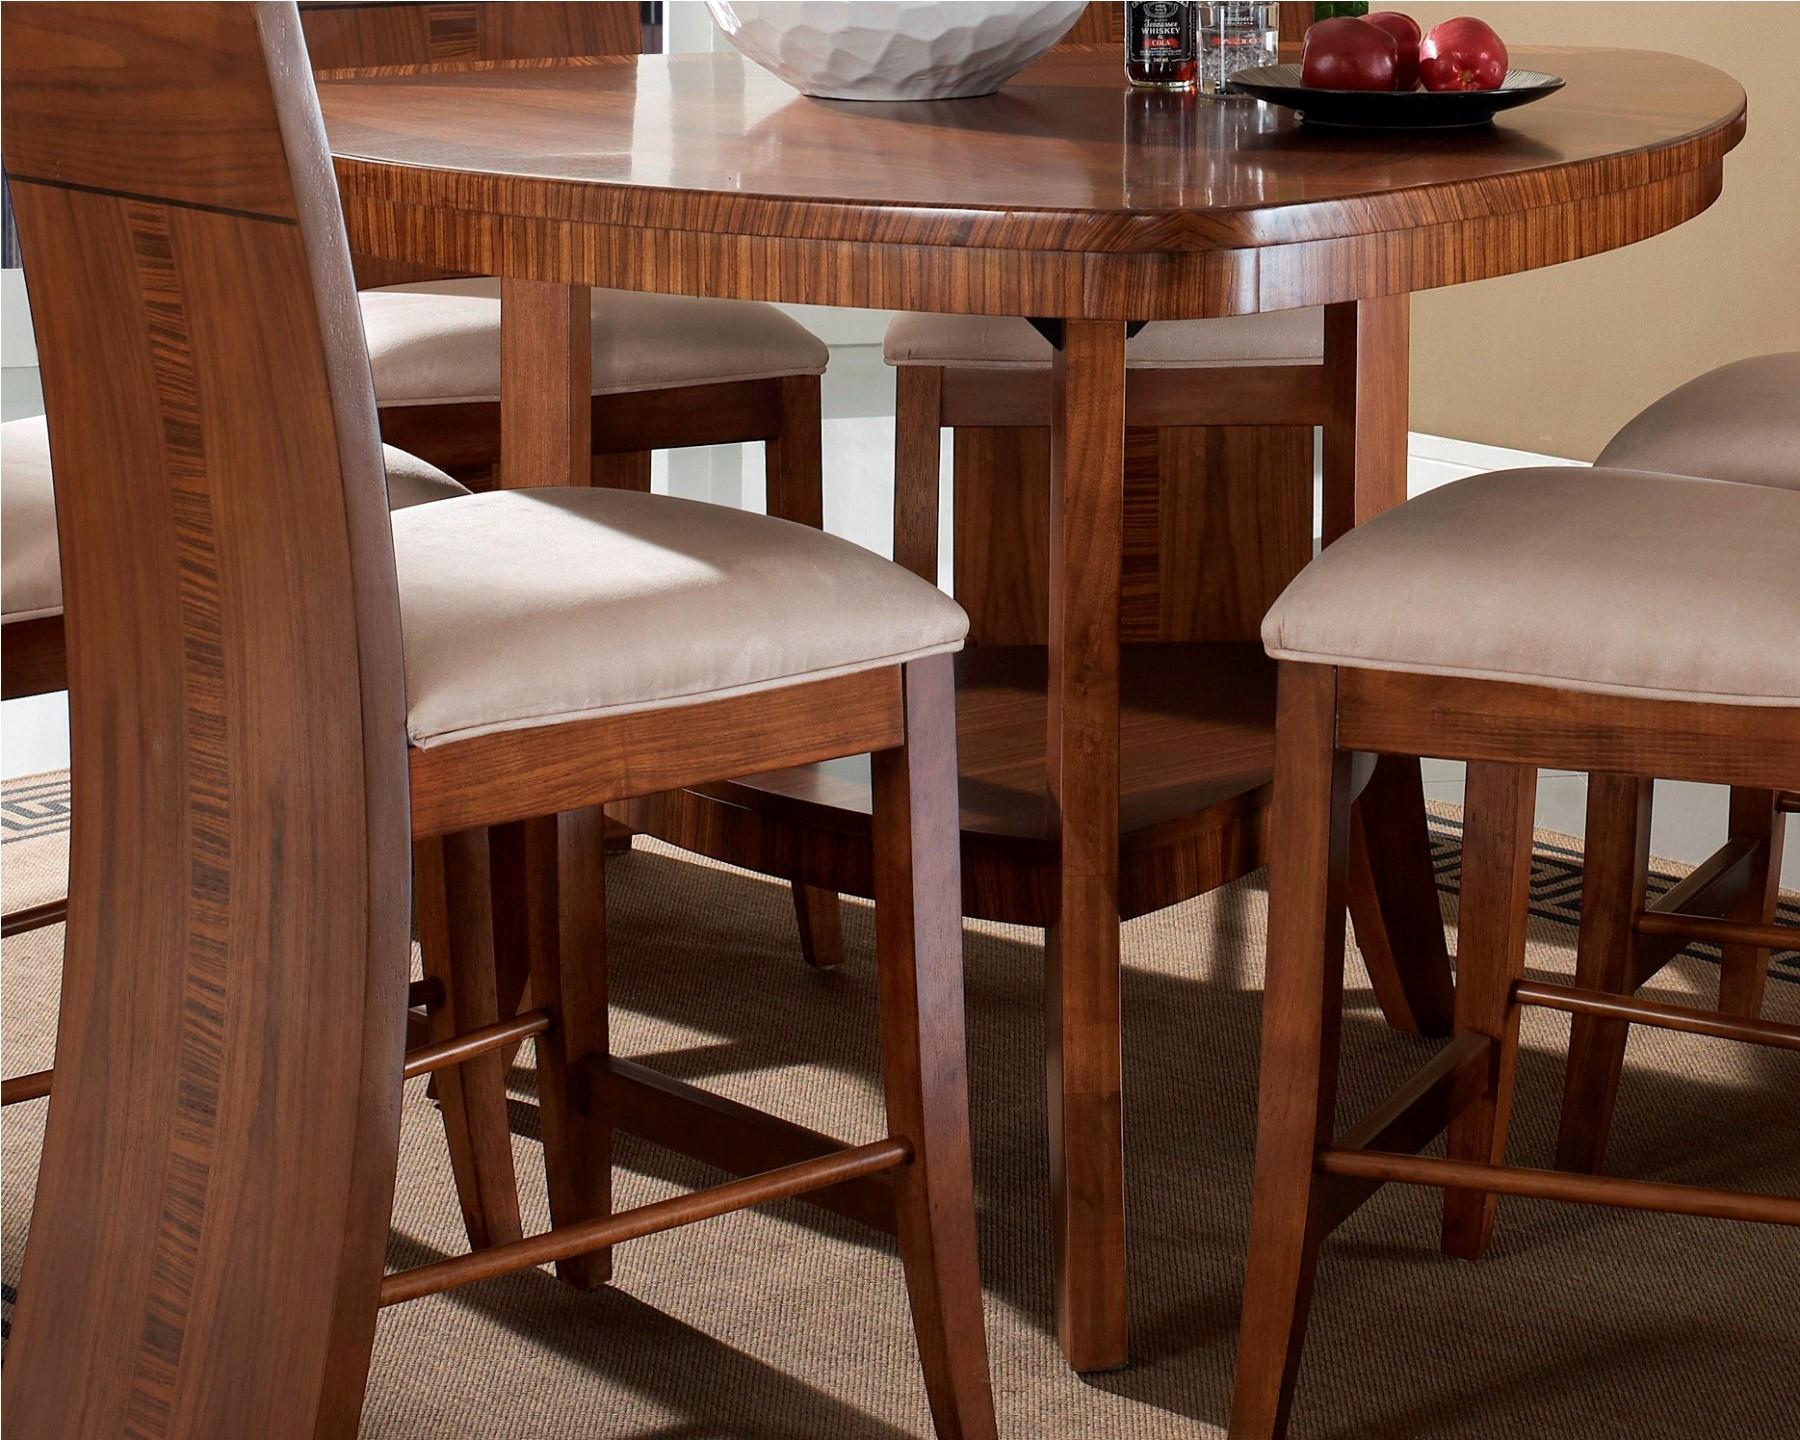 Milan triangular counter height dining room set from somerton dwelling 153 68 coleman furniture - Triangle counter height dining set ...